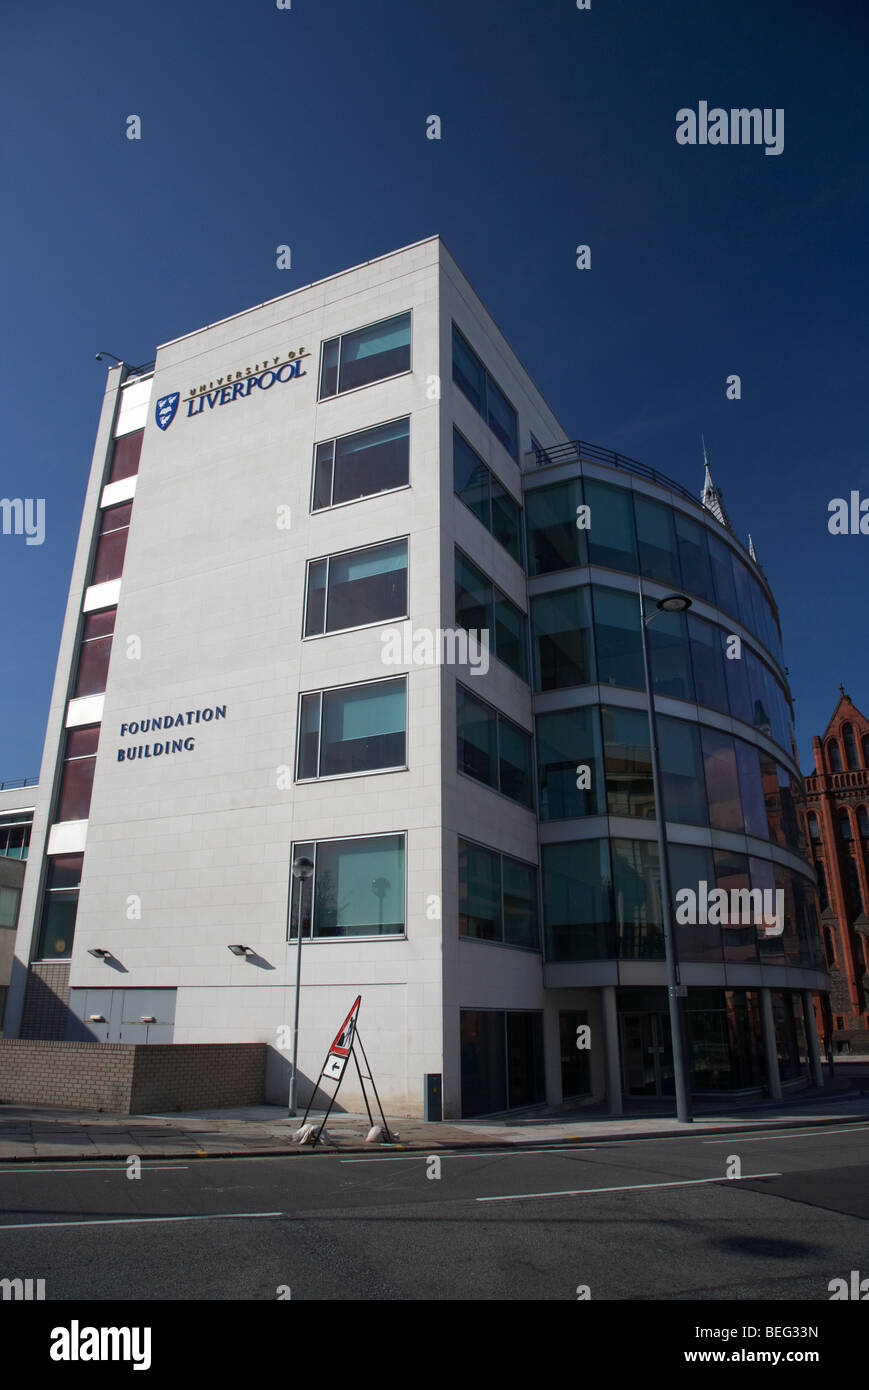 university of liverpool foundation building merseyside england uk - Stock Image